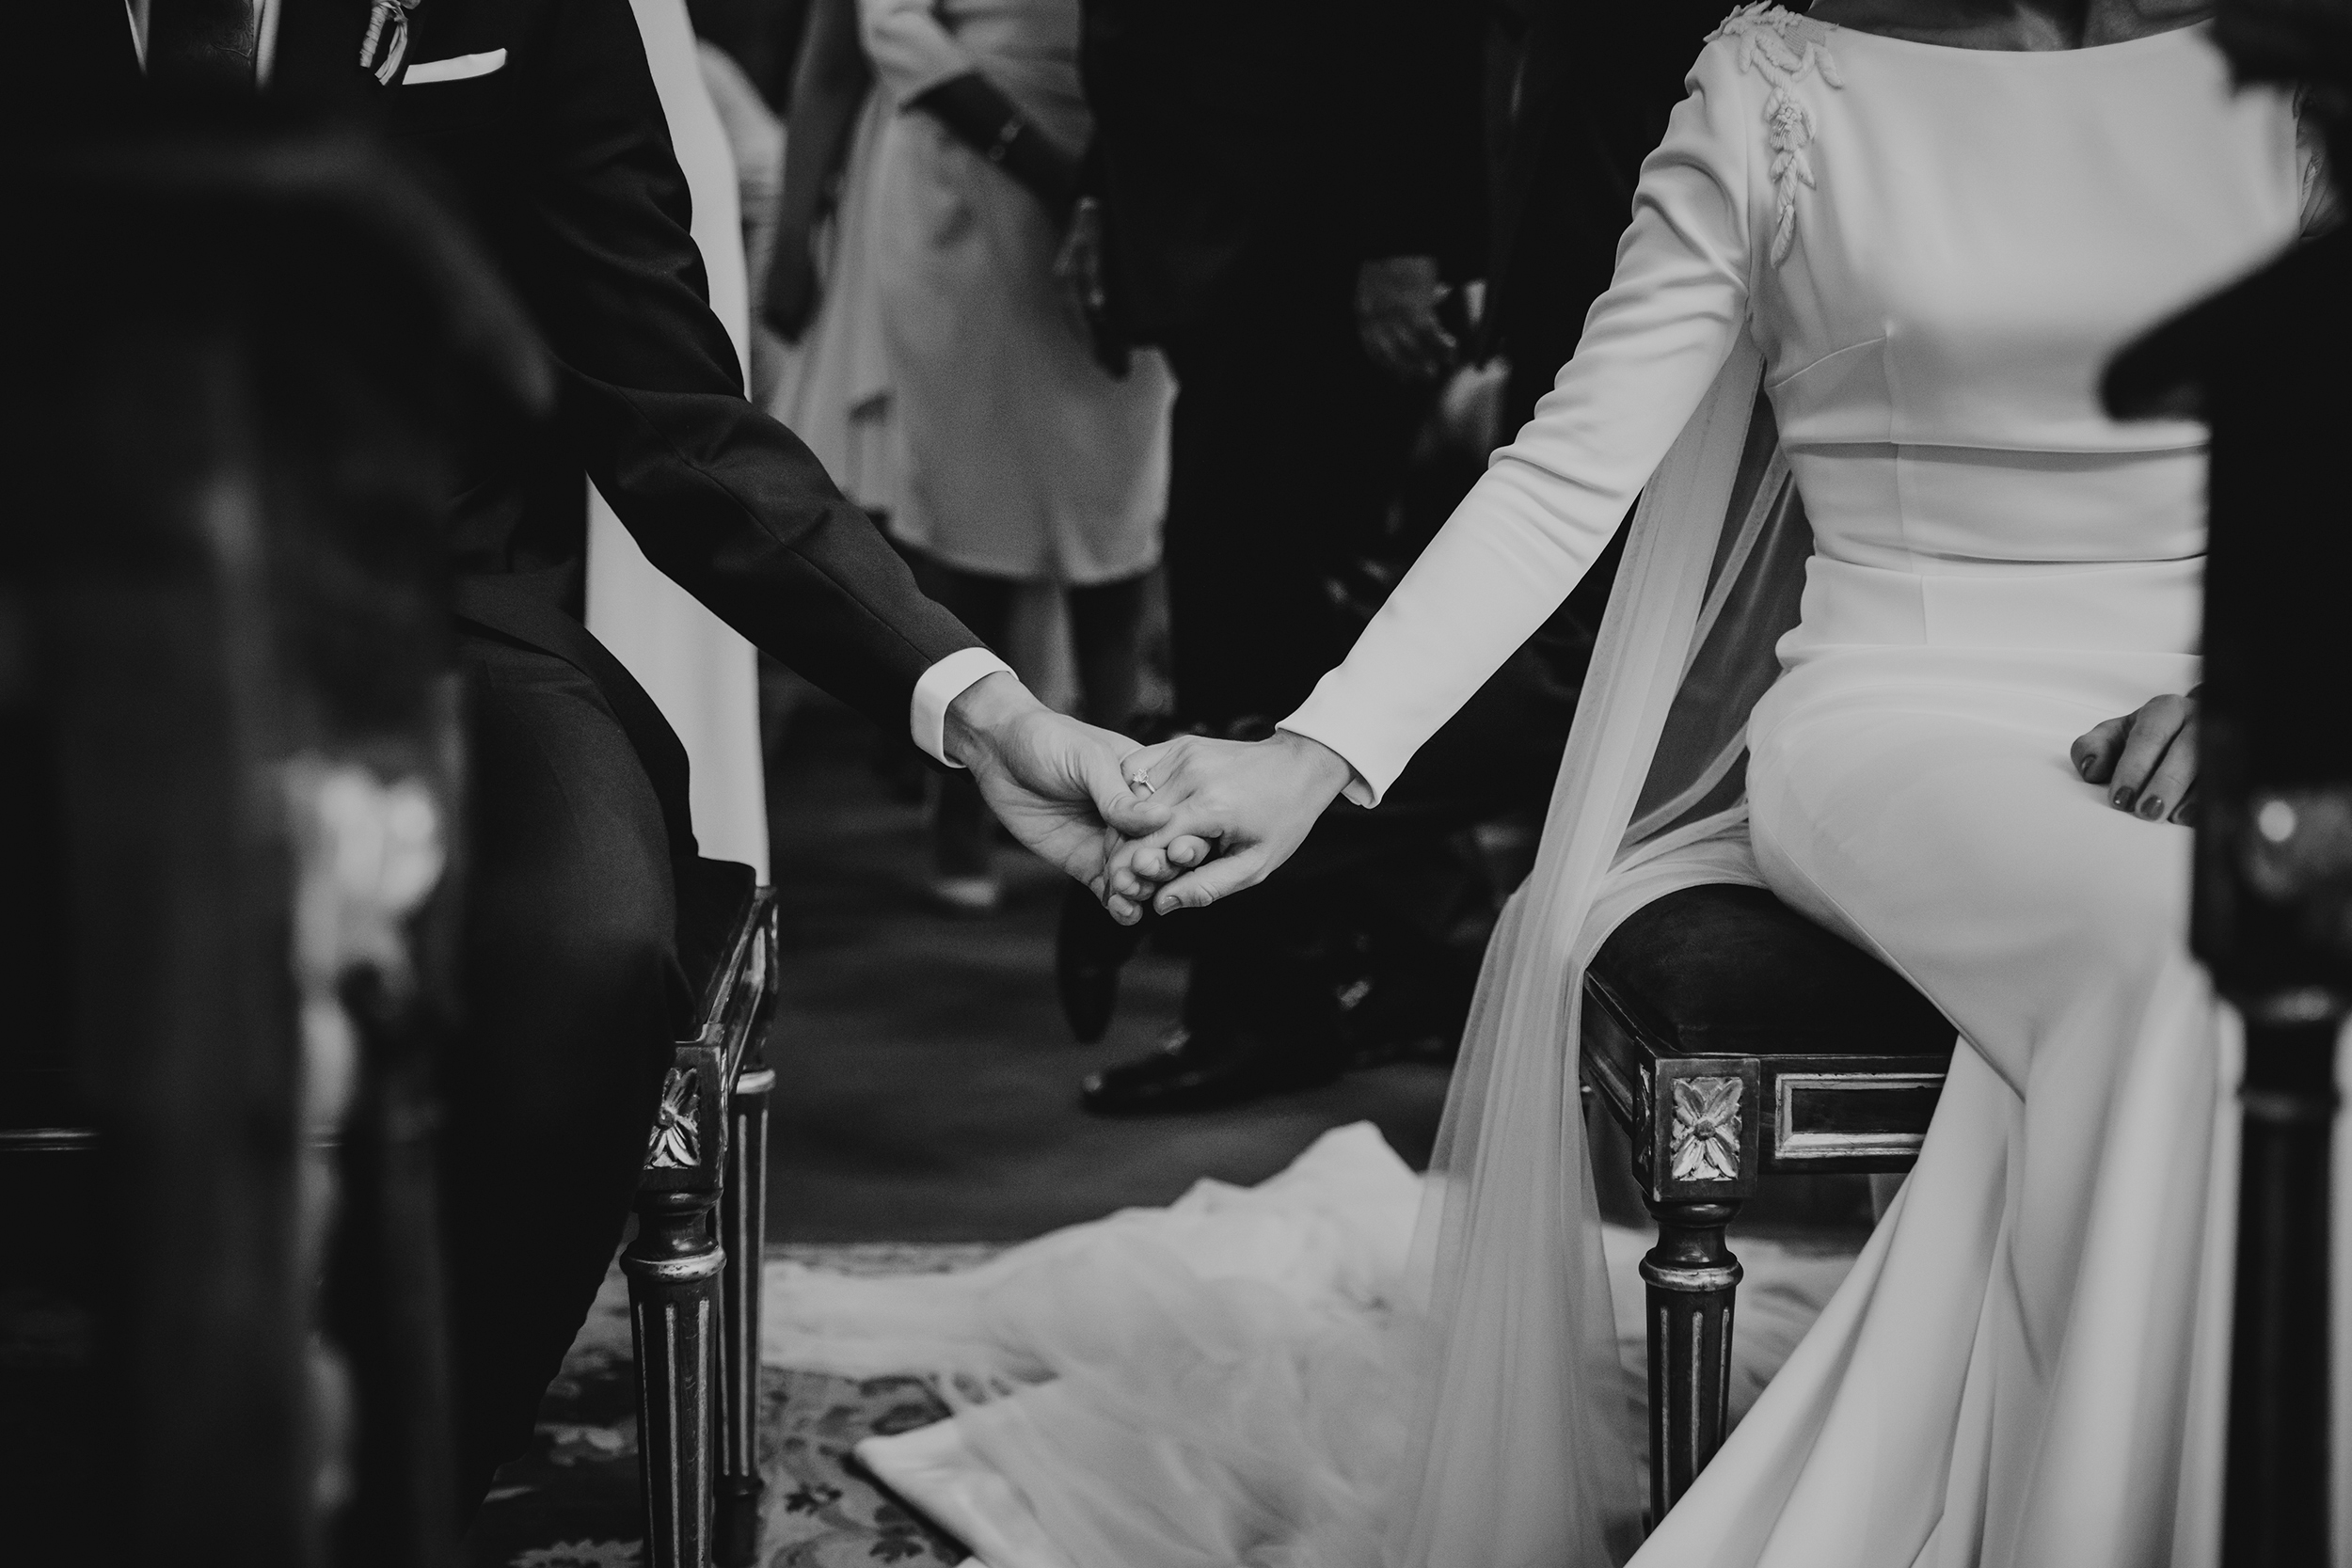 fotografo-bodas-granada-catedral-sagrario-jose-reyes_048.jpg